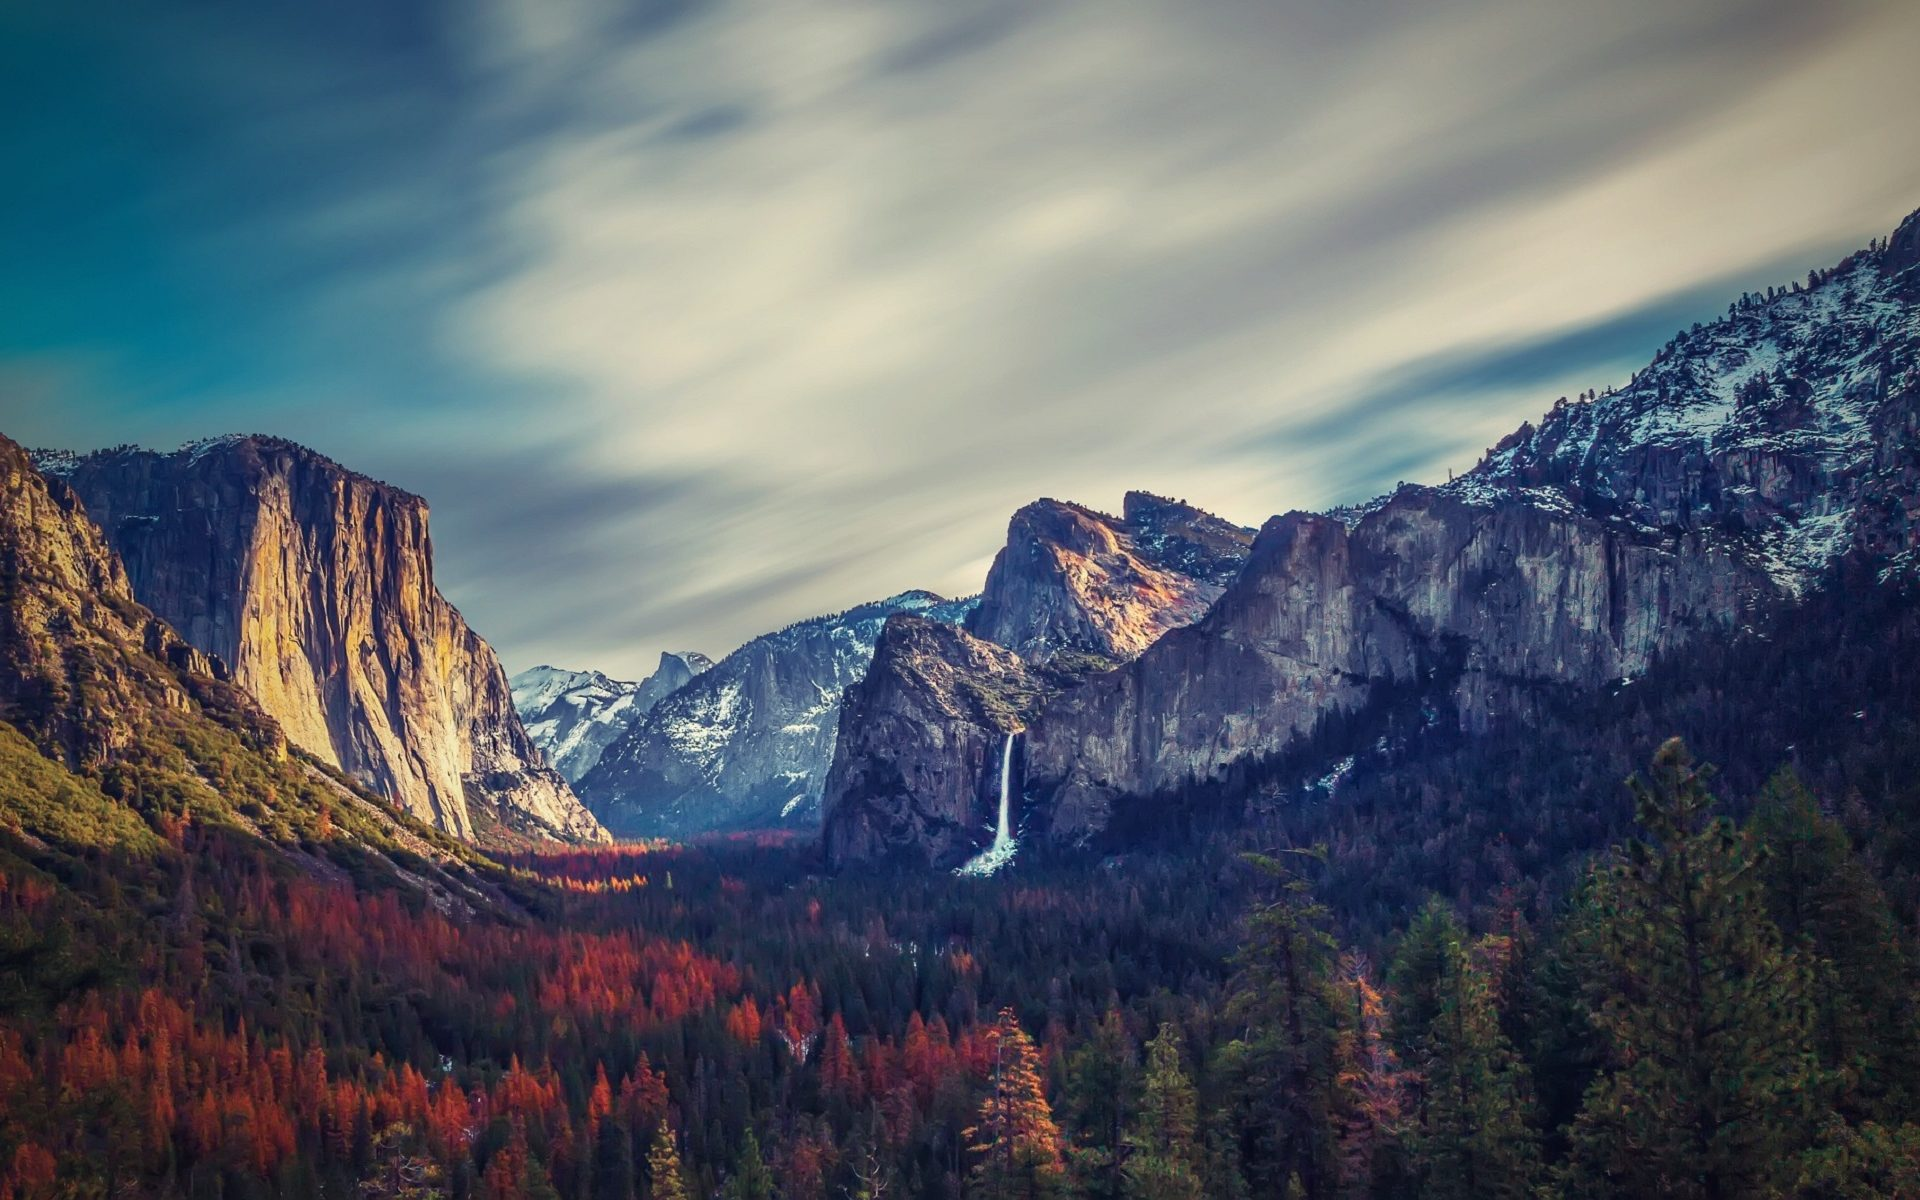 Iphone X Usa Wallpaper Yosemite Valley Wallpaper Background Hd Wallpaper Background